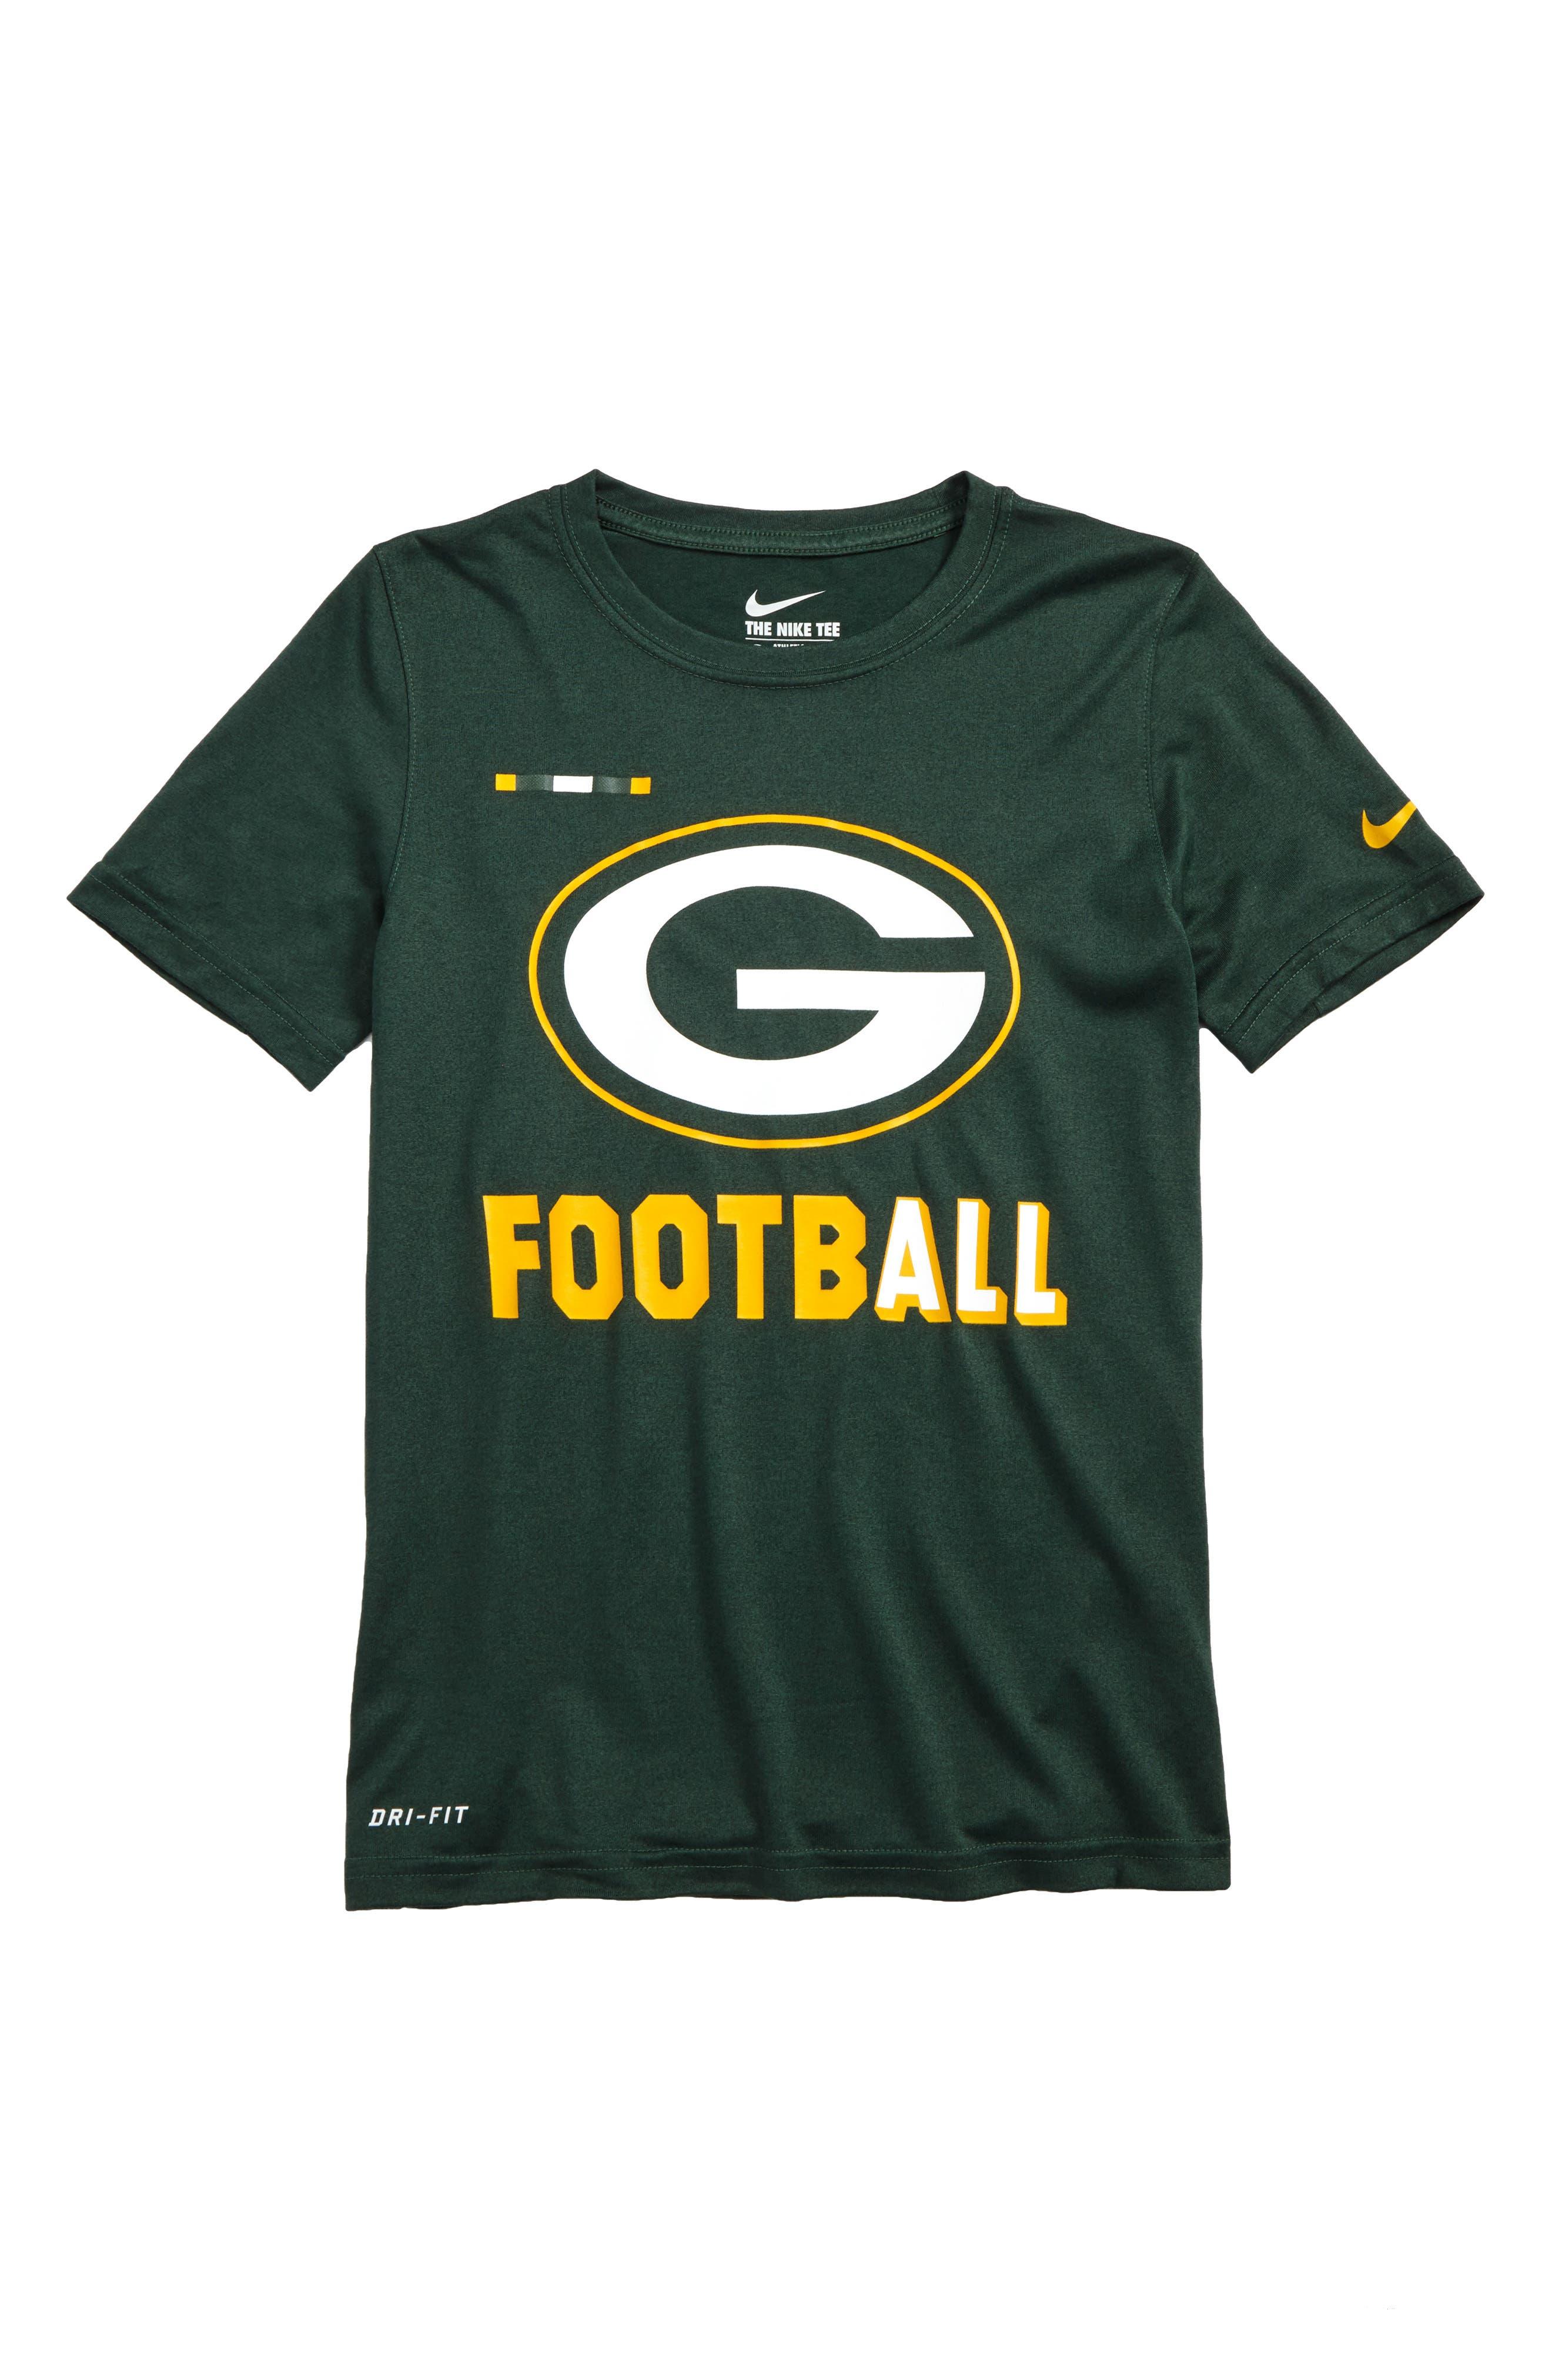 Nike NFL Logo - Green Bay Packers Dry T-Shirt,                             Main thumbnail 1, color,                             Fir